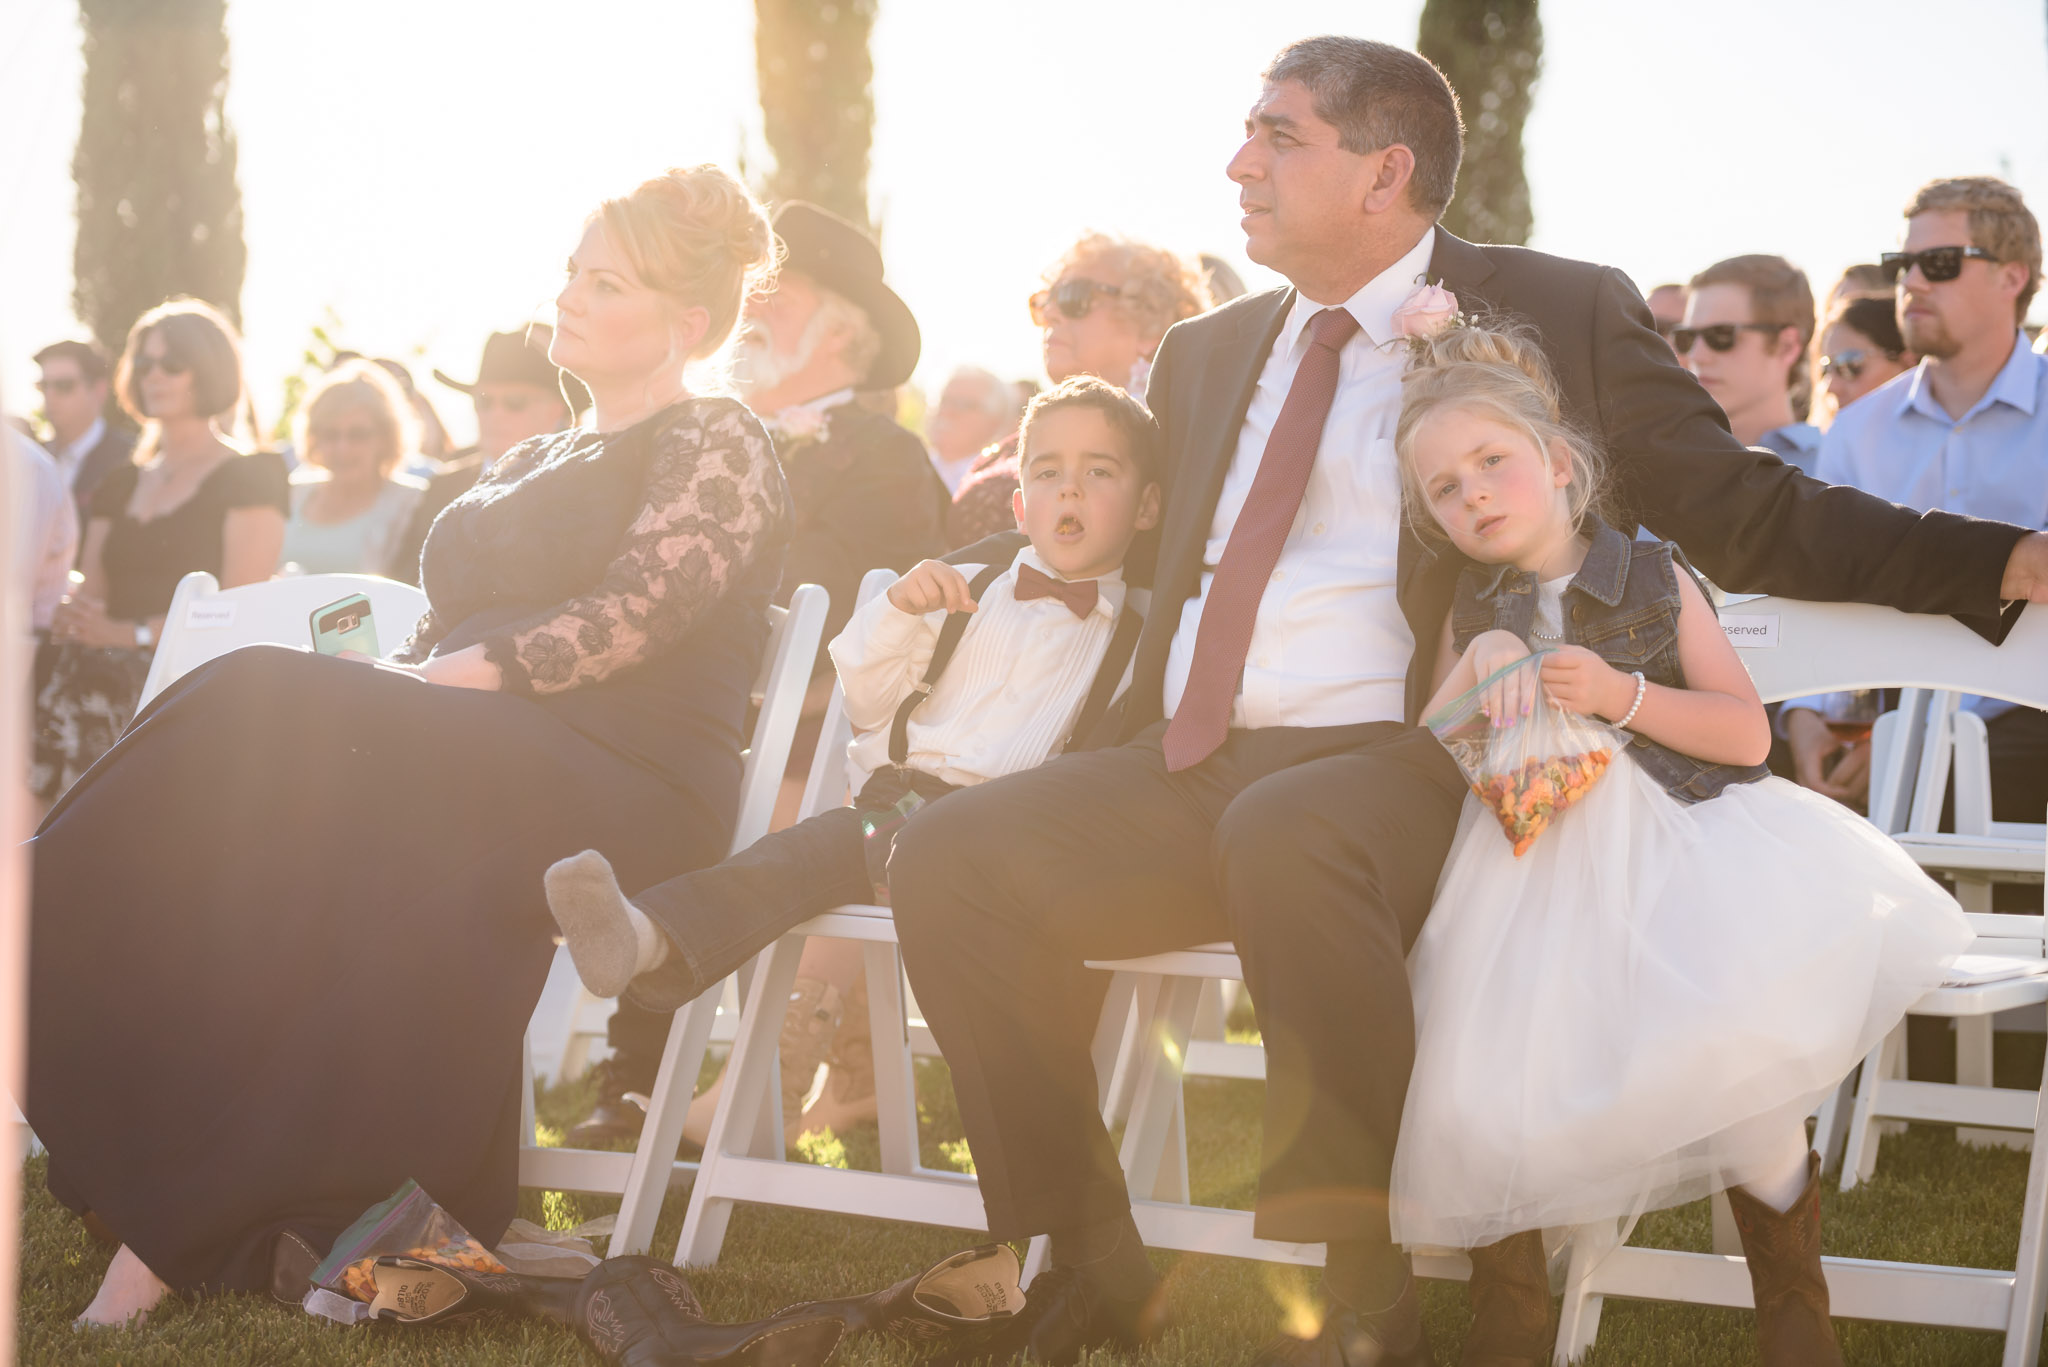 Avensole-Winery-Temecula-Wedding-Josh-and-Olivia-3516.JPG